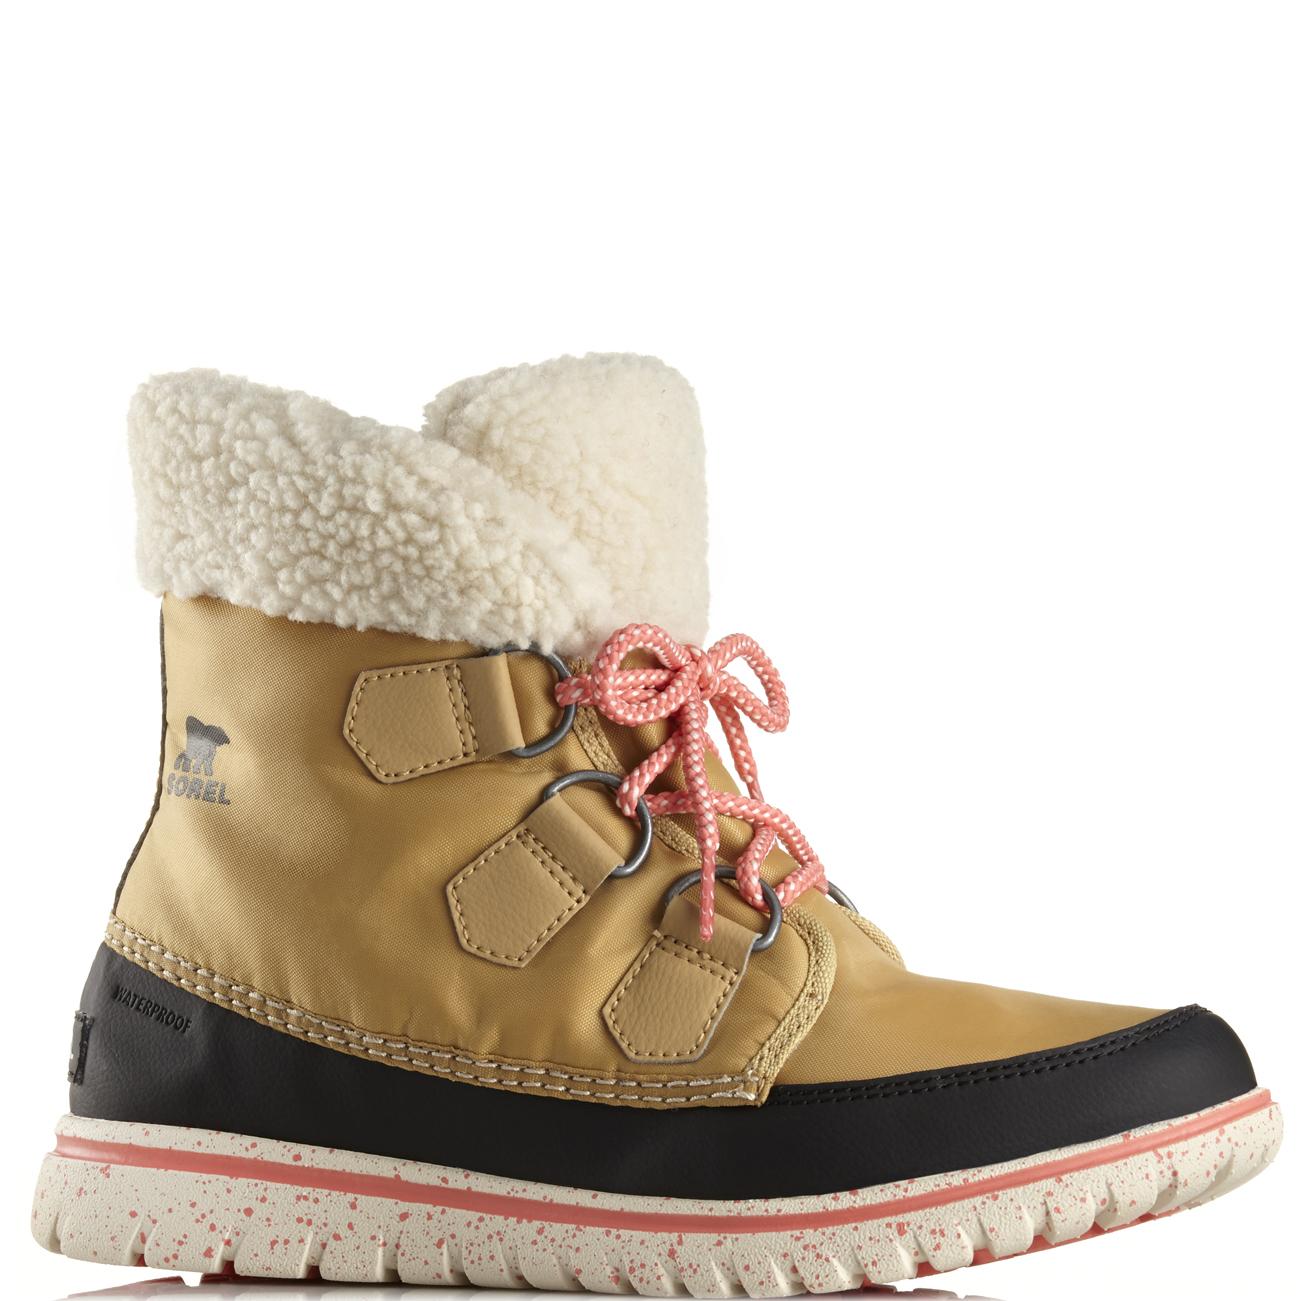 Women Swaterproof Shoes For Rain